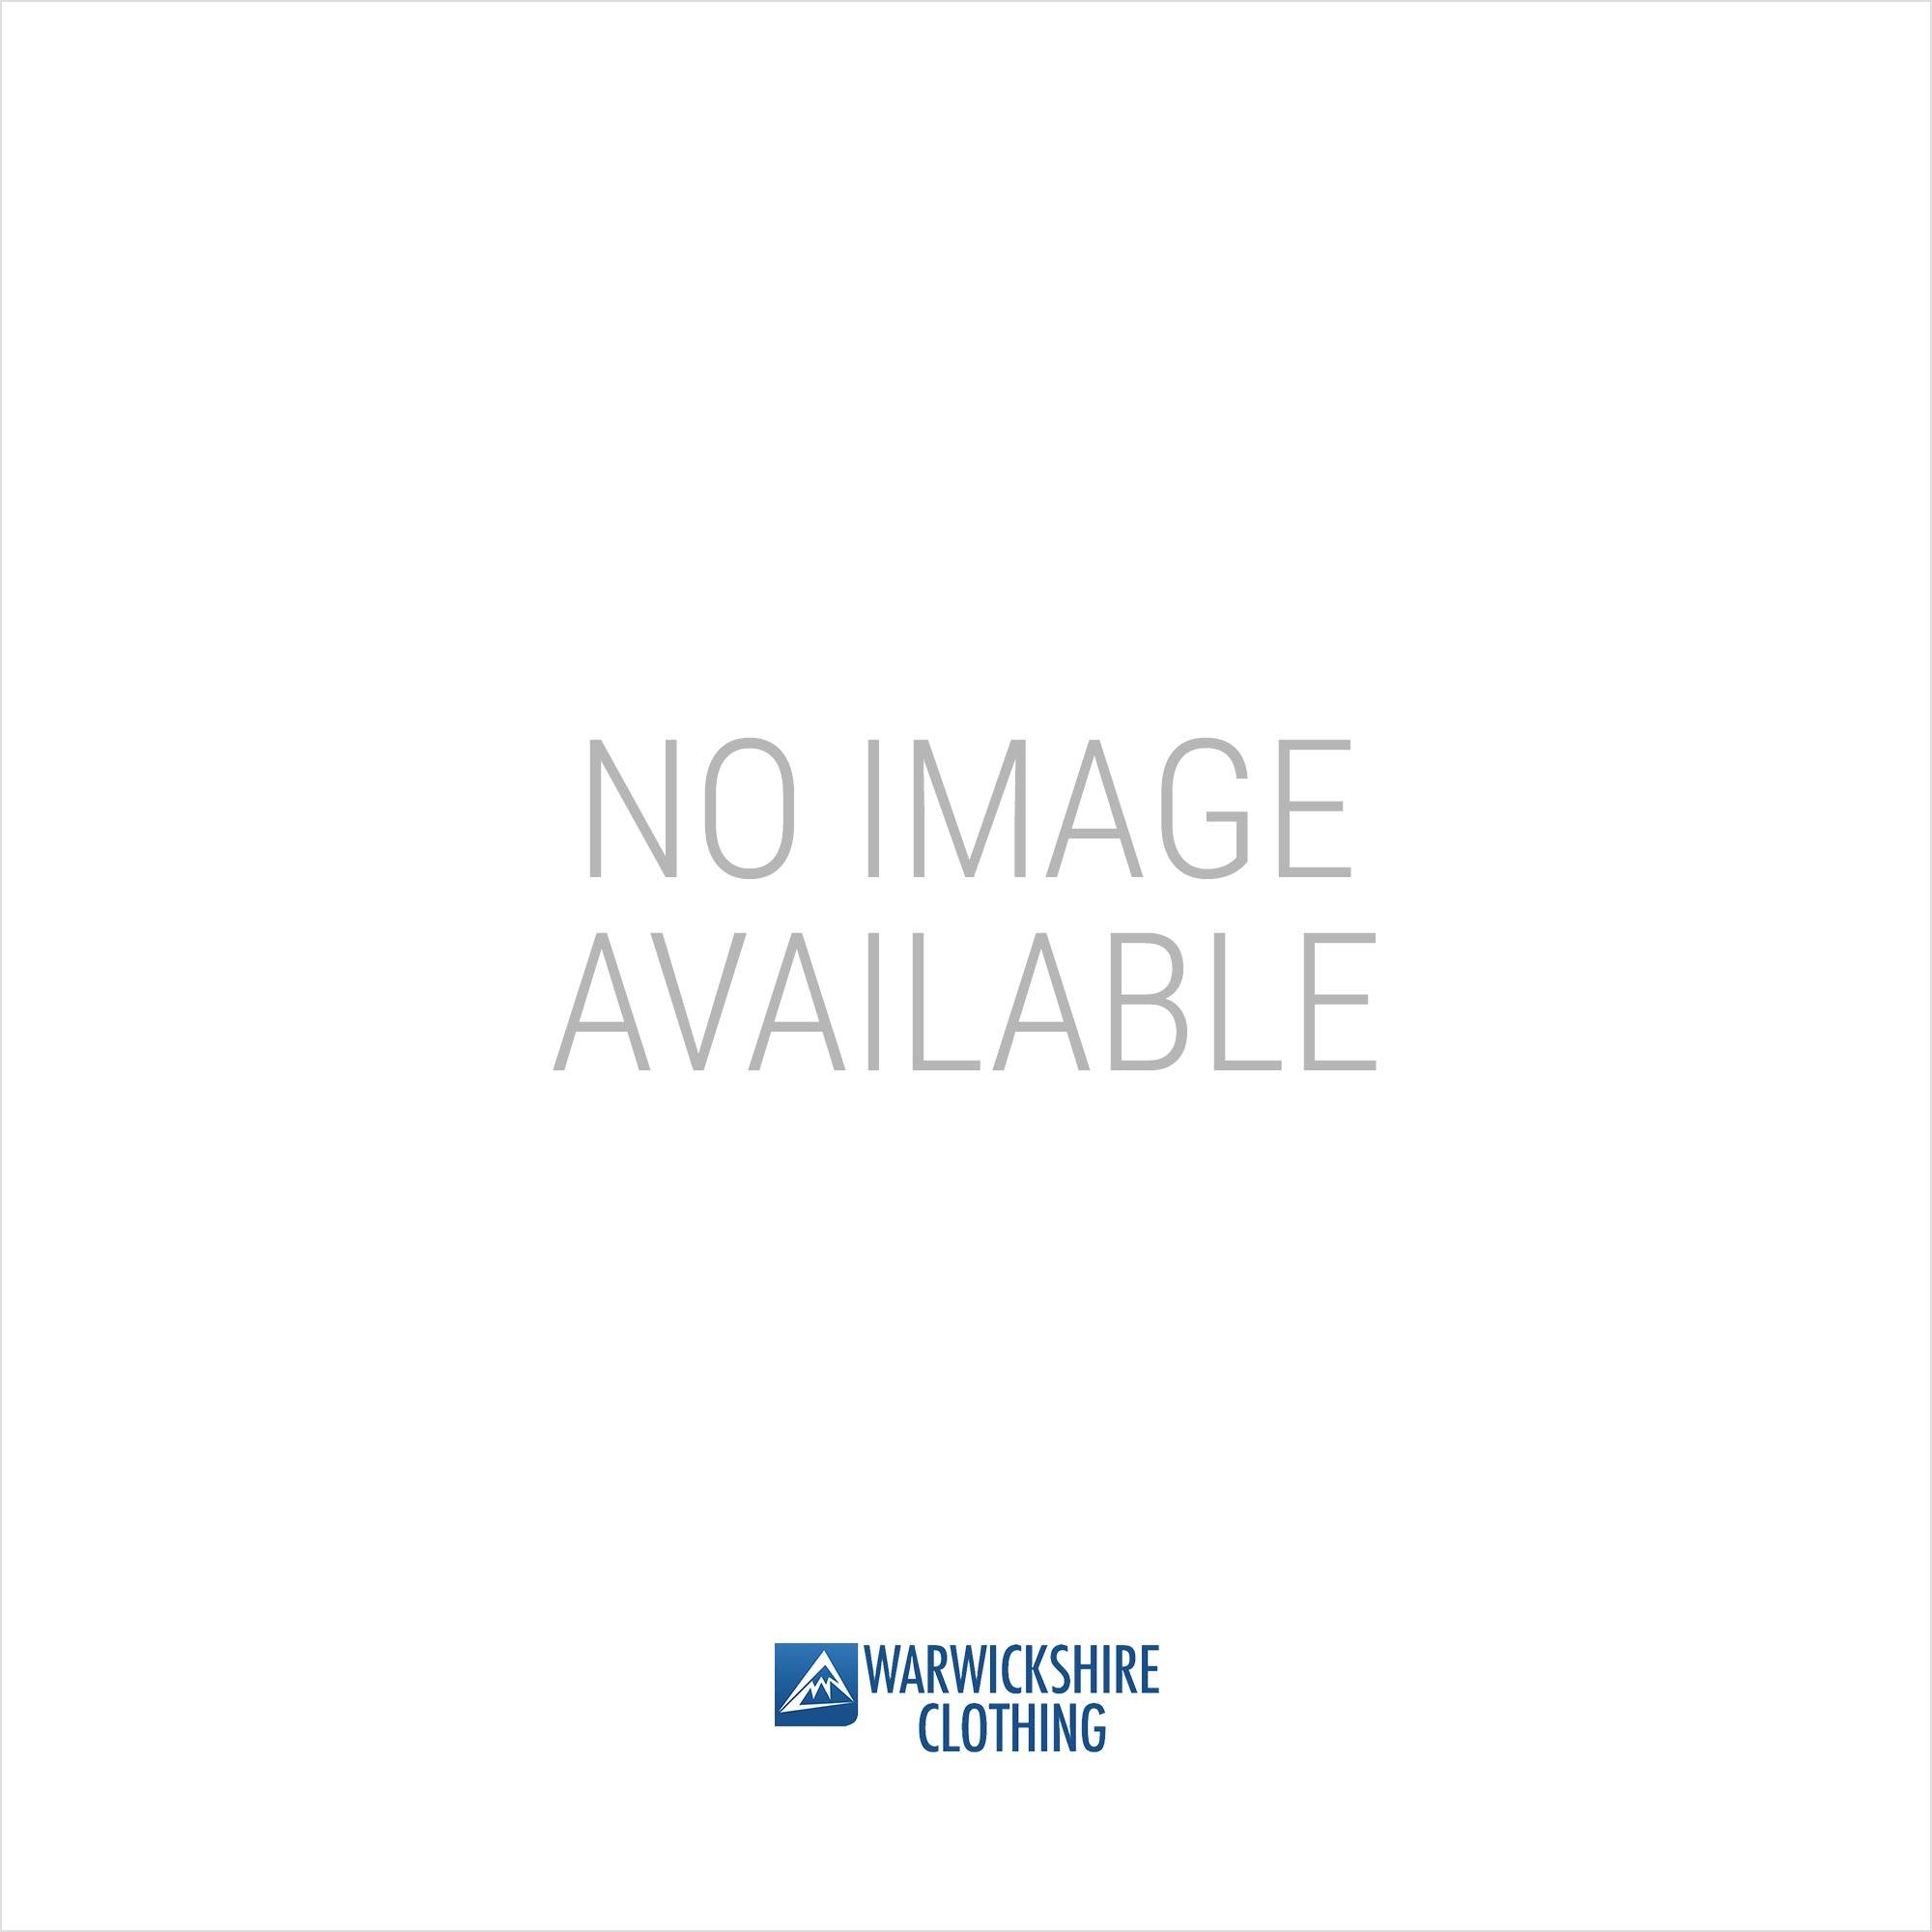 2df848263d792 Regatta Kids Waterproof Puddle Suit | Warwickshire Clothing